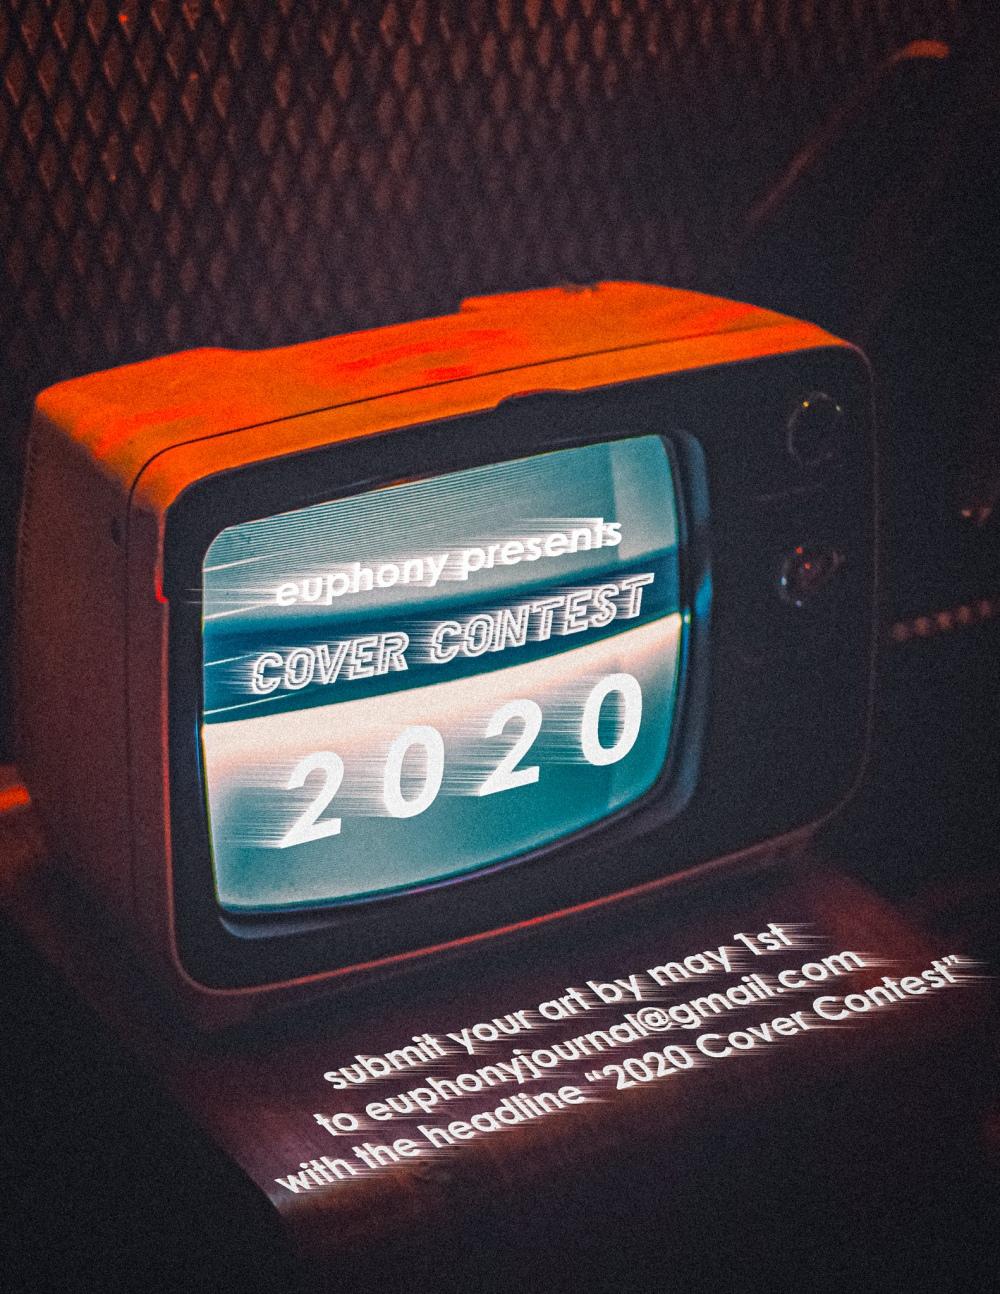 2020 cover contest